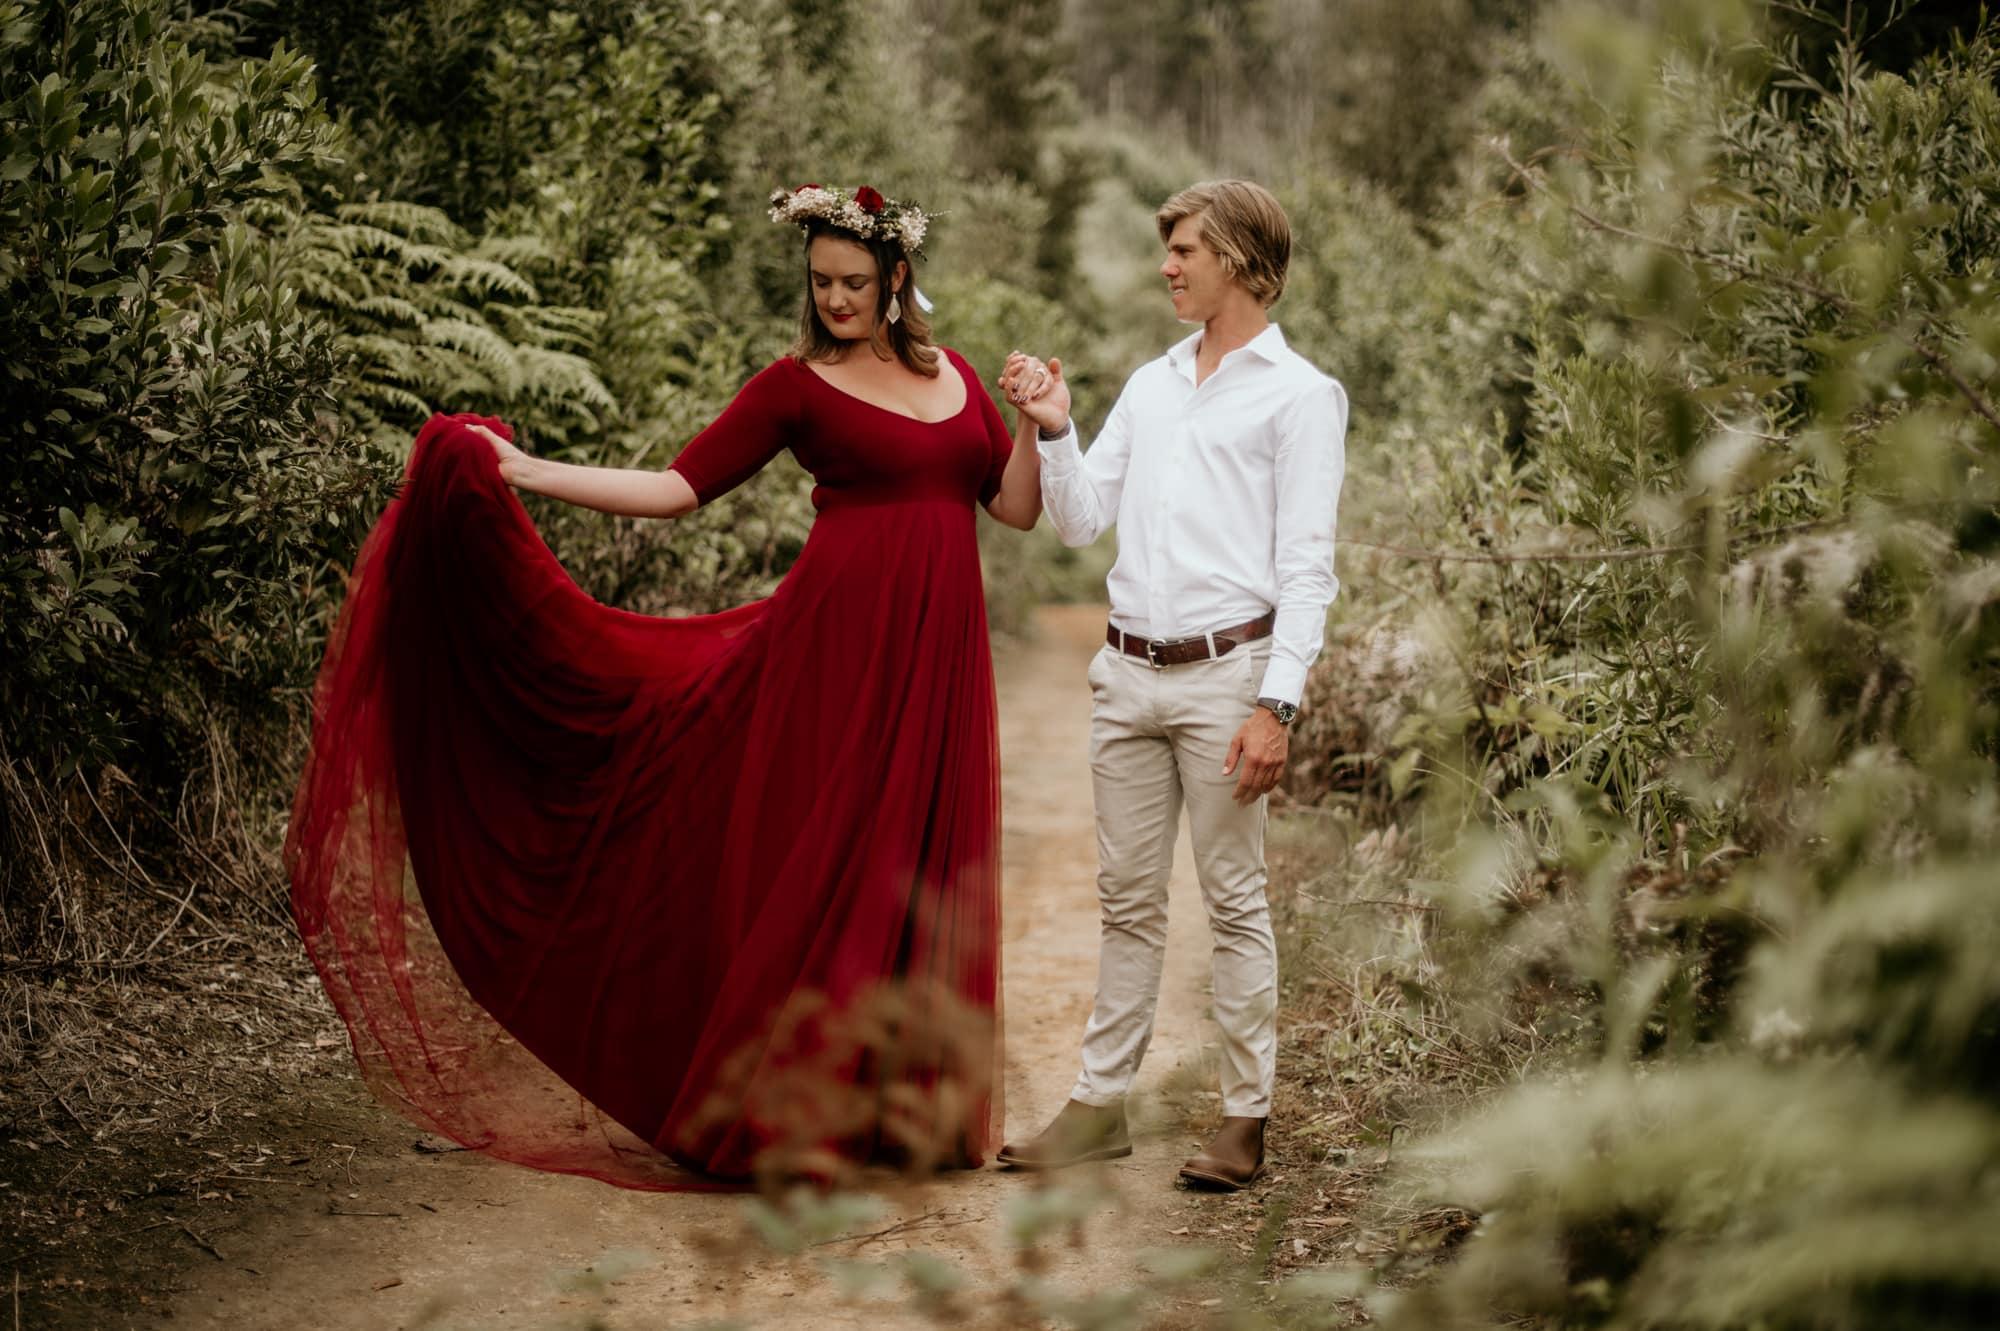 wesley-lanie-george-fernridge-engagement-June-Richards-Photography-Destination-Weddings-Elopements-Garden-Route-18